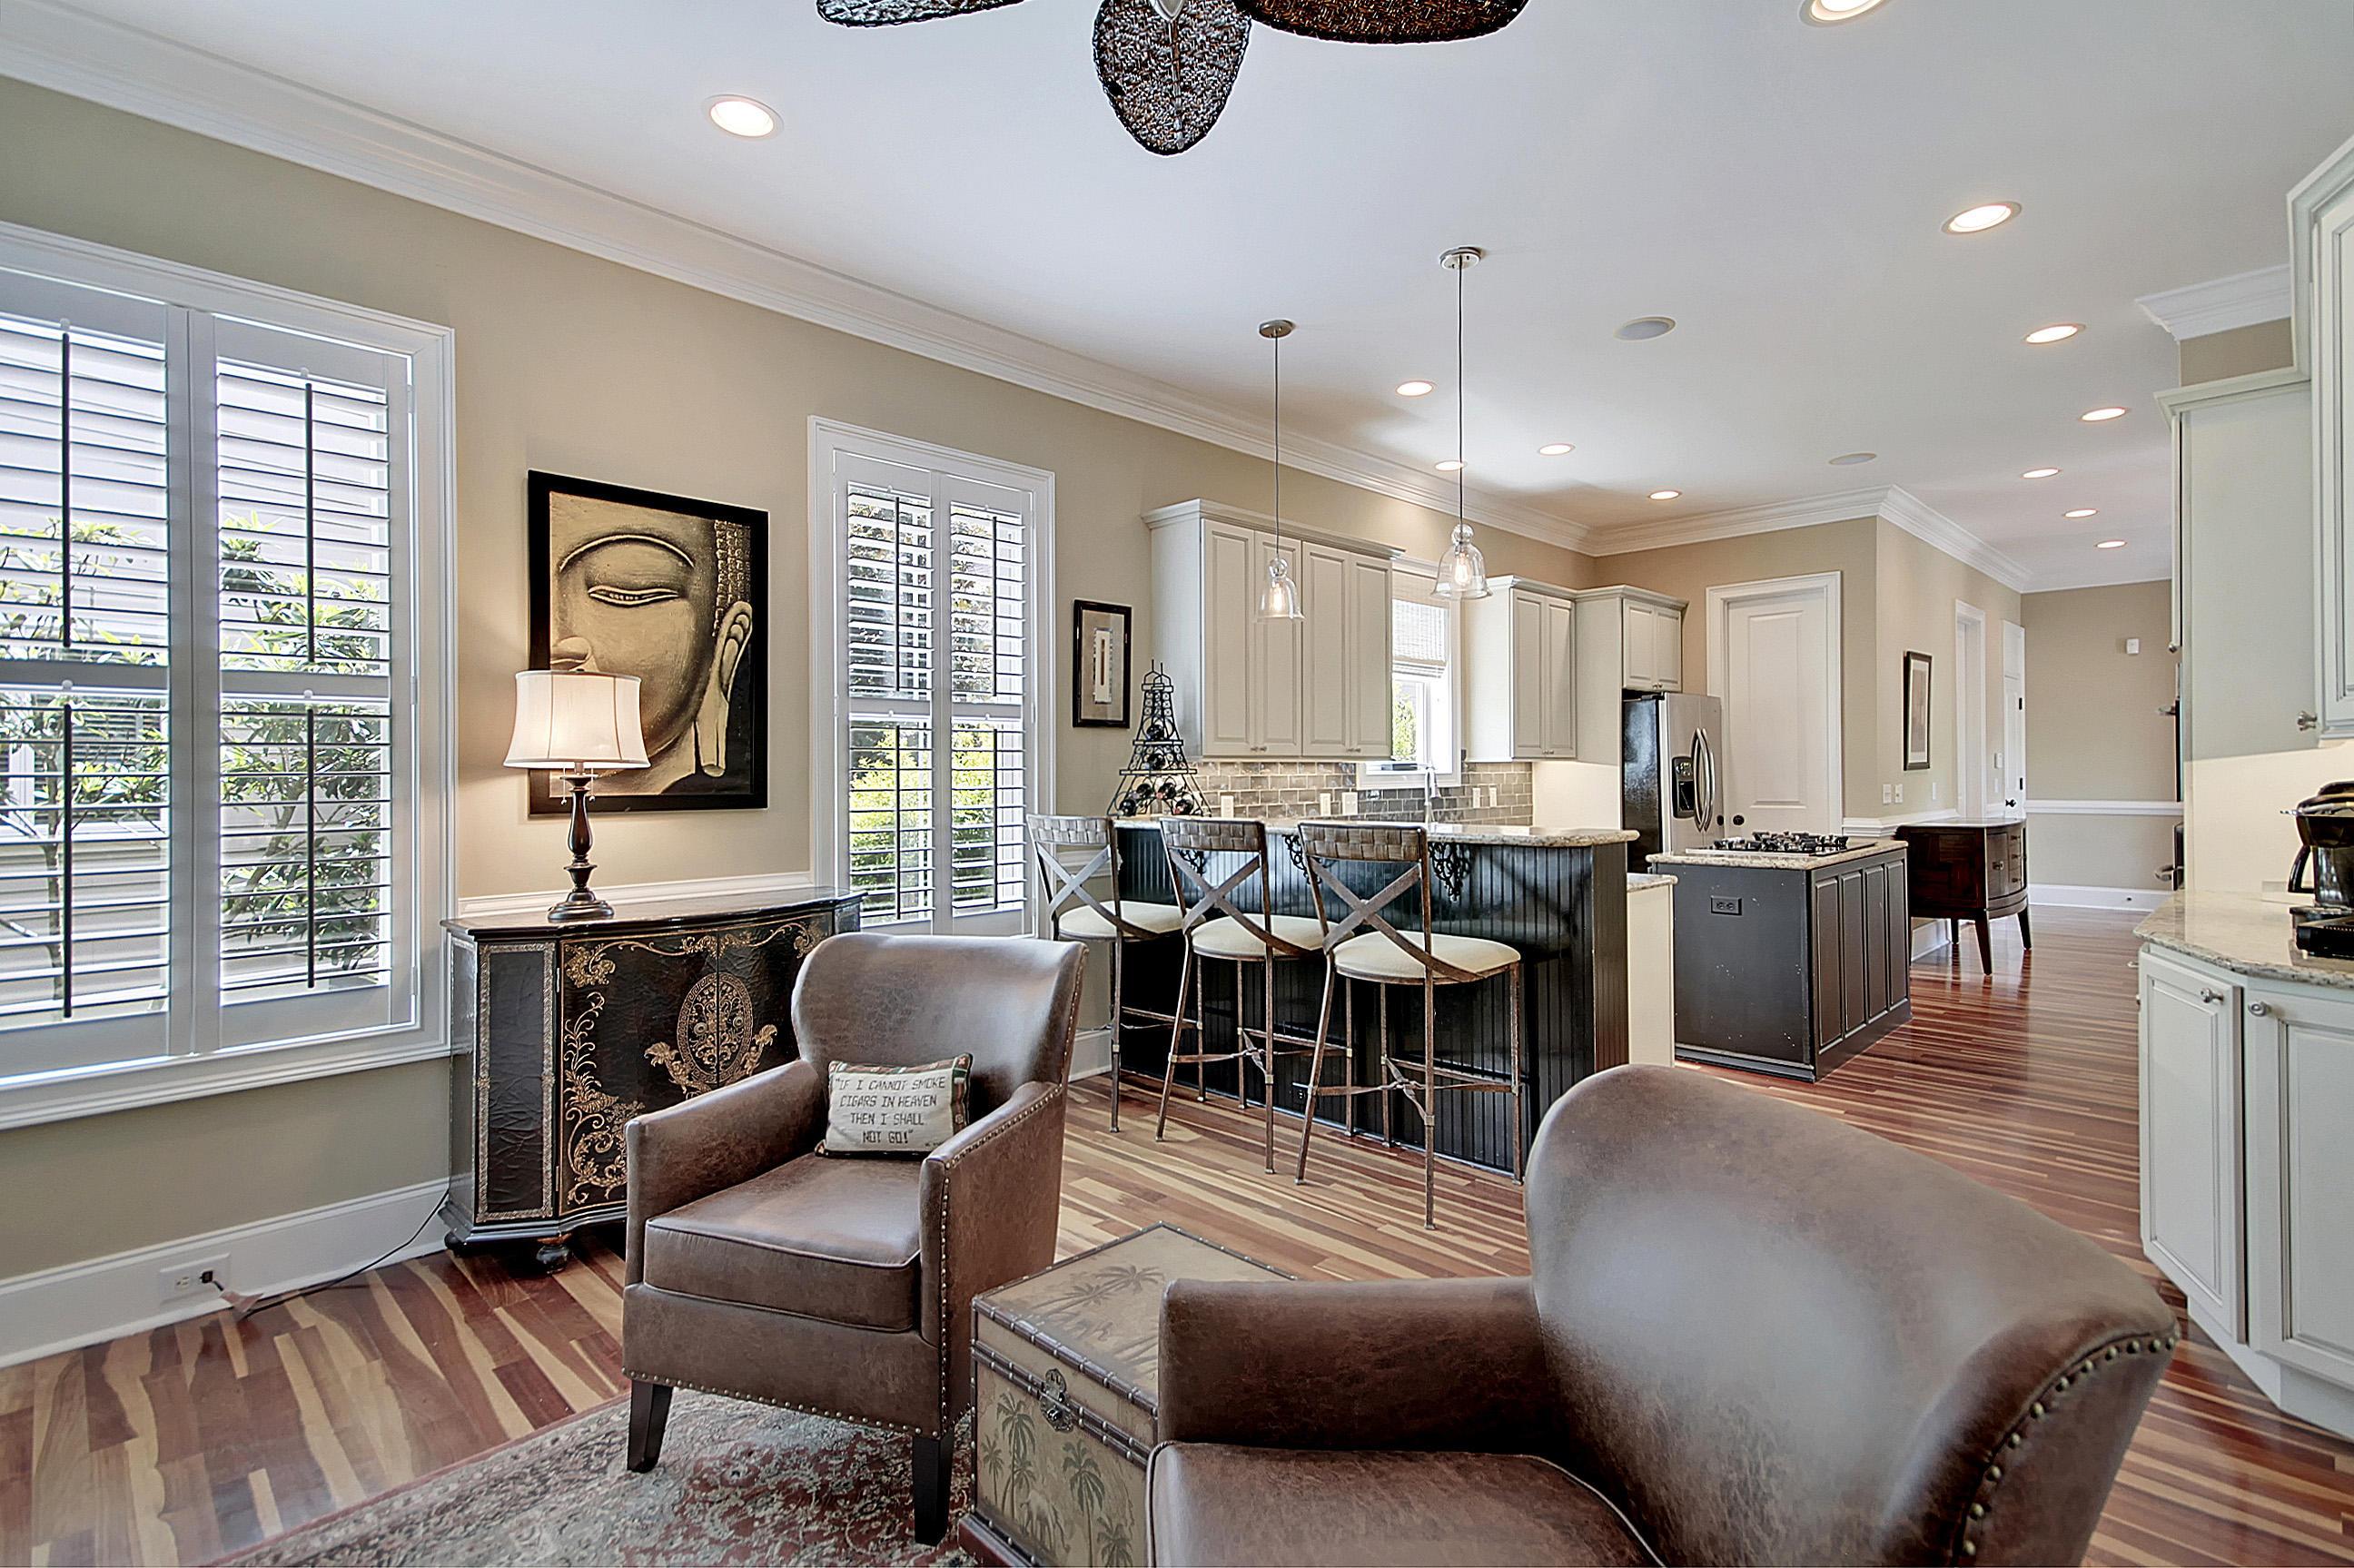 Belle Hall Homes For Sale - 368 Evian, Mount Pleasant, SC - 8